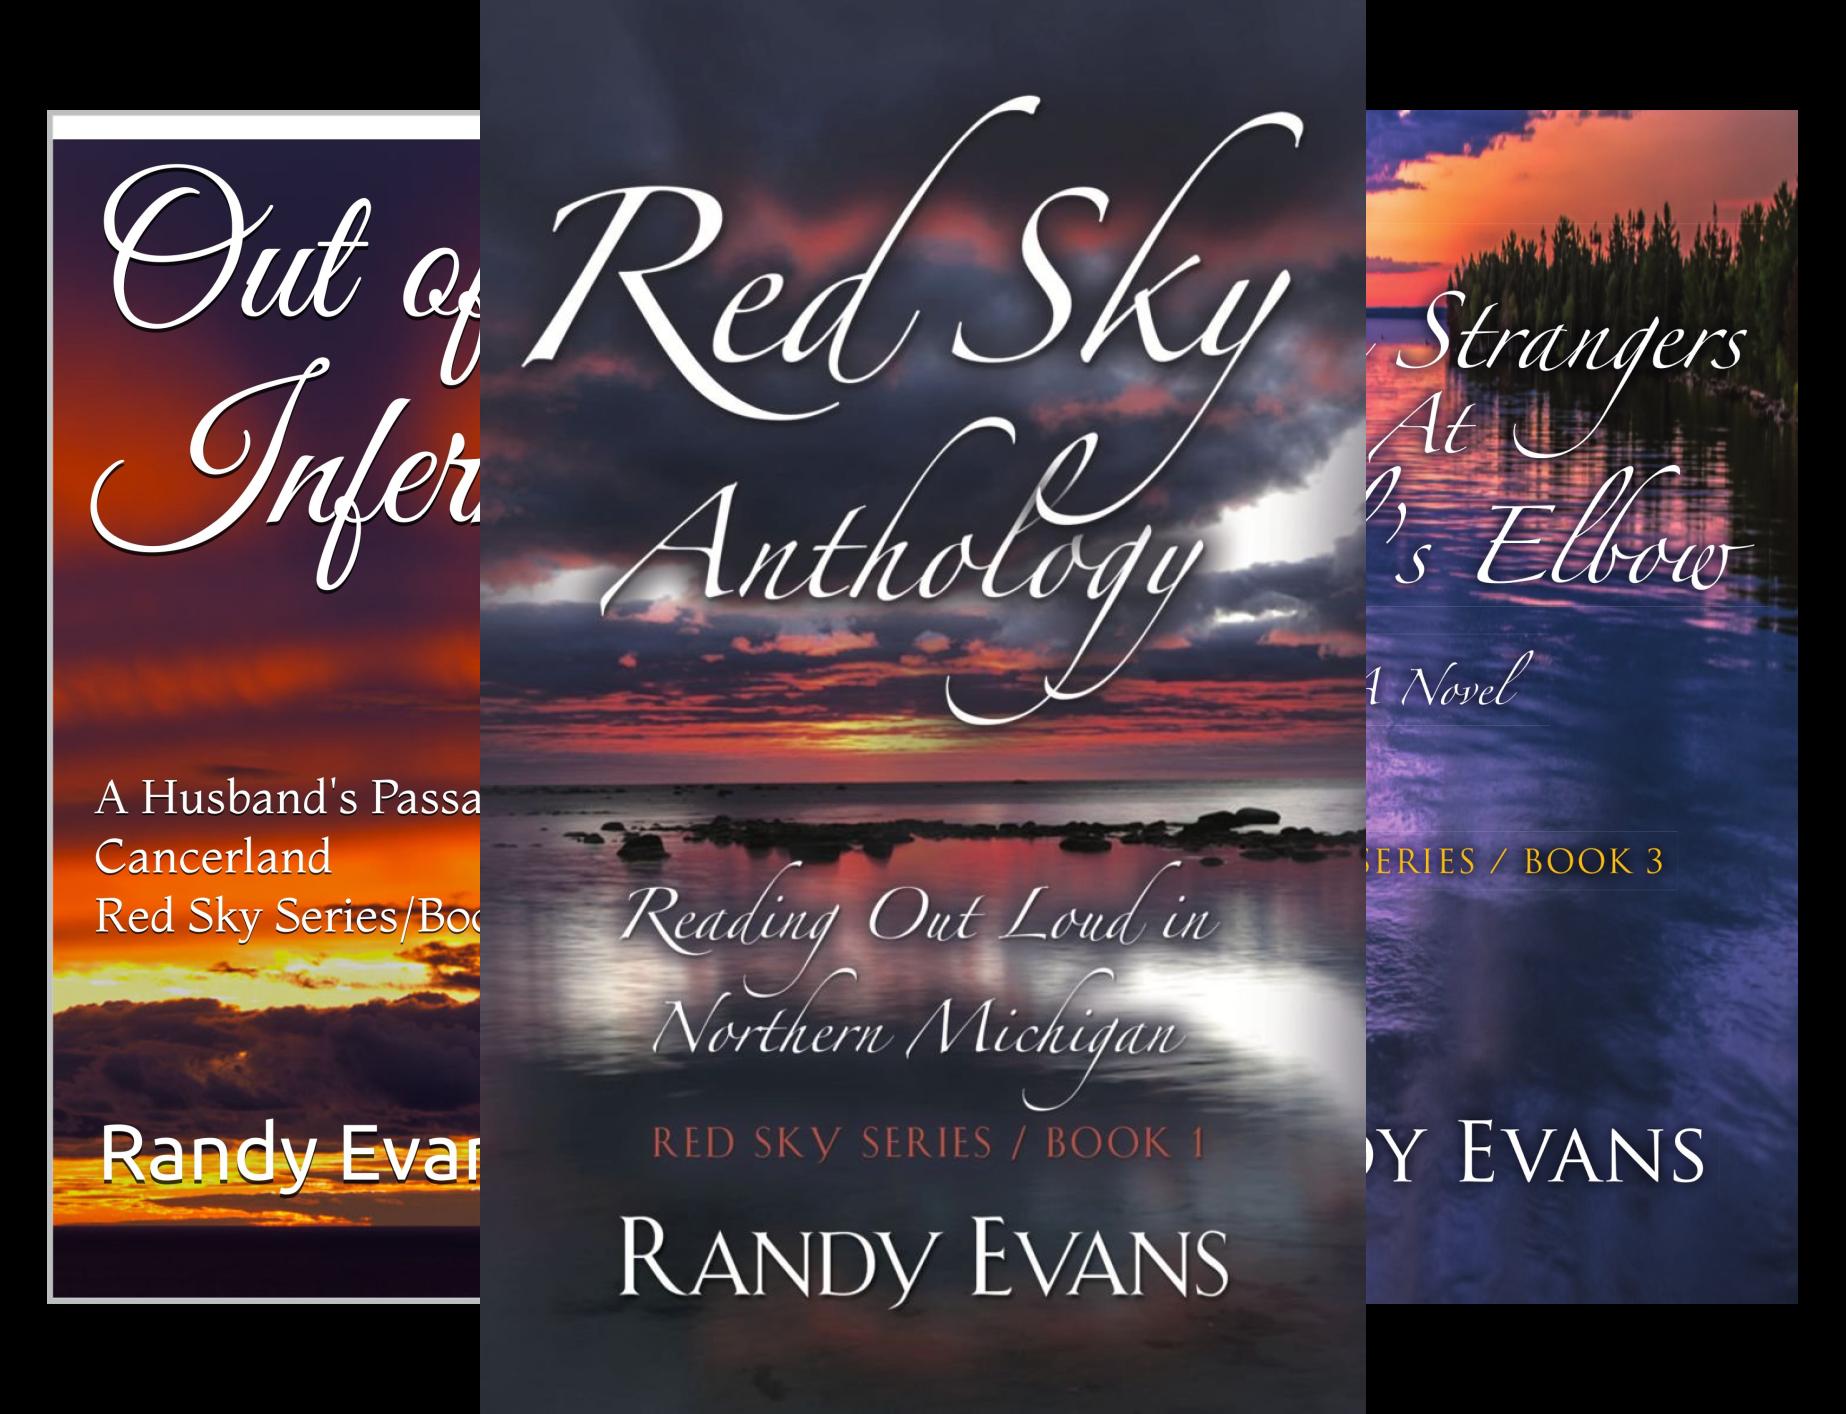 Red Sky Series (3 Book Series)